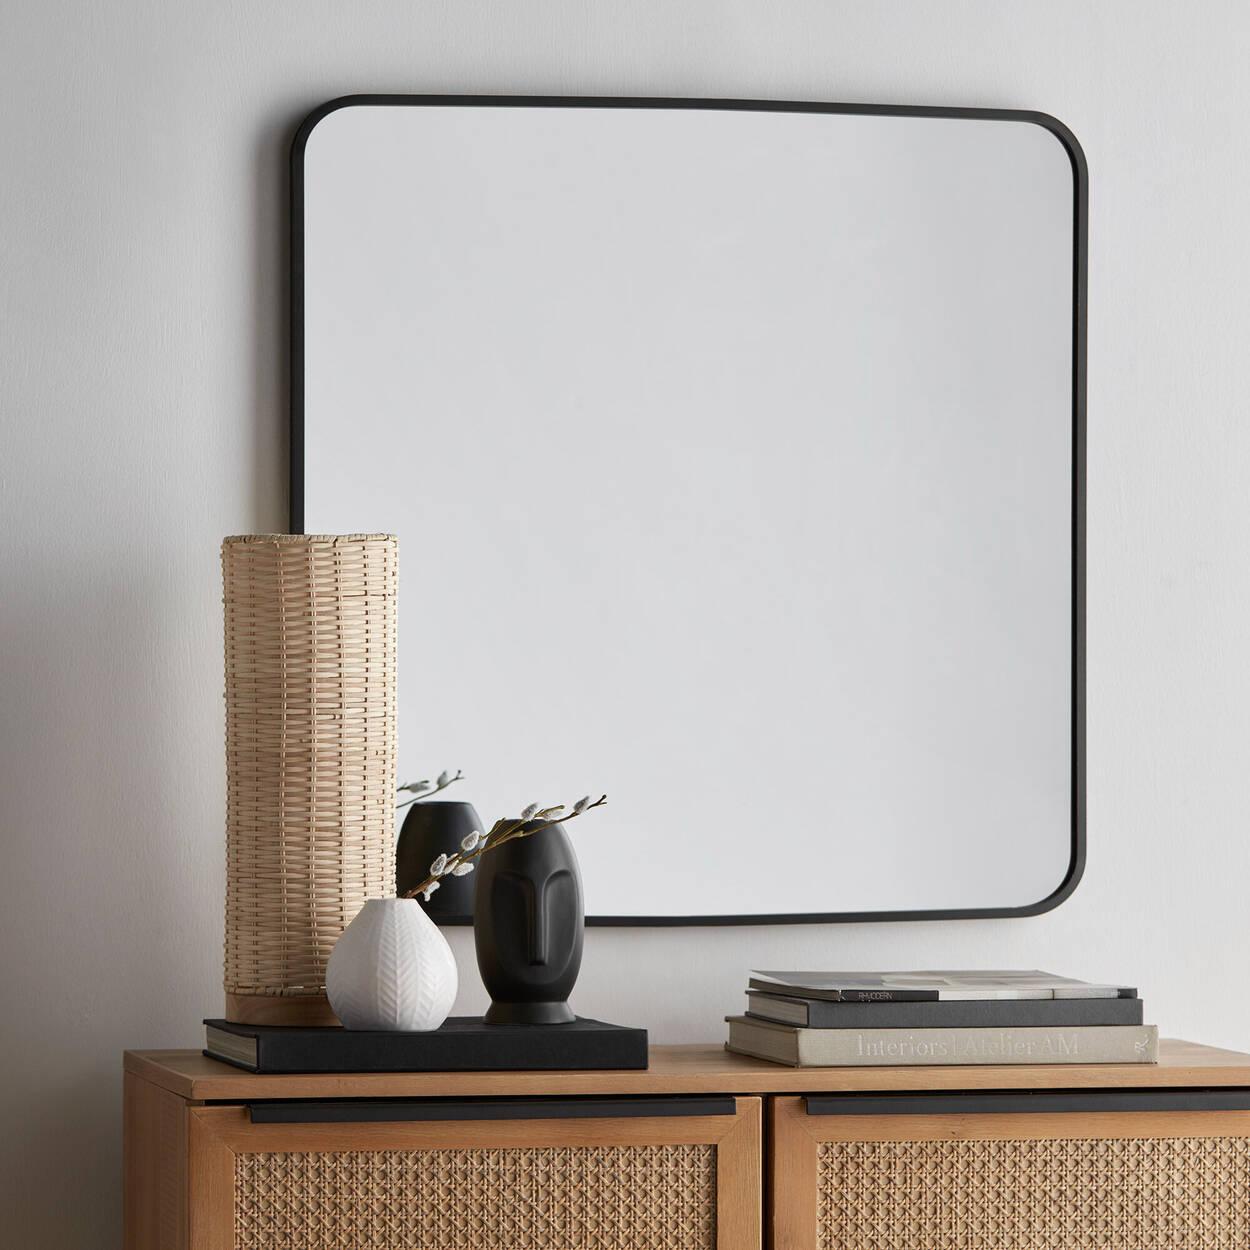 Miroir d'angle rond à cadre en aluminium